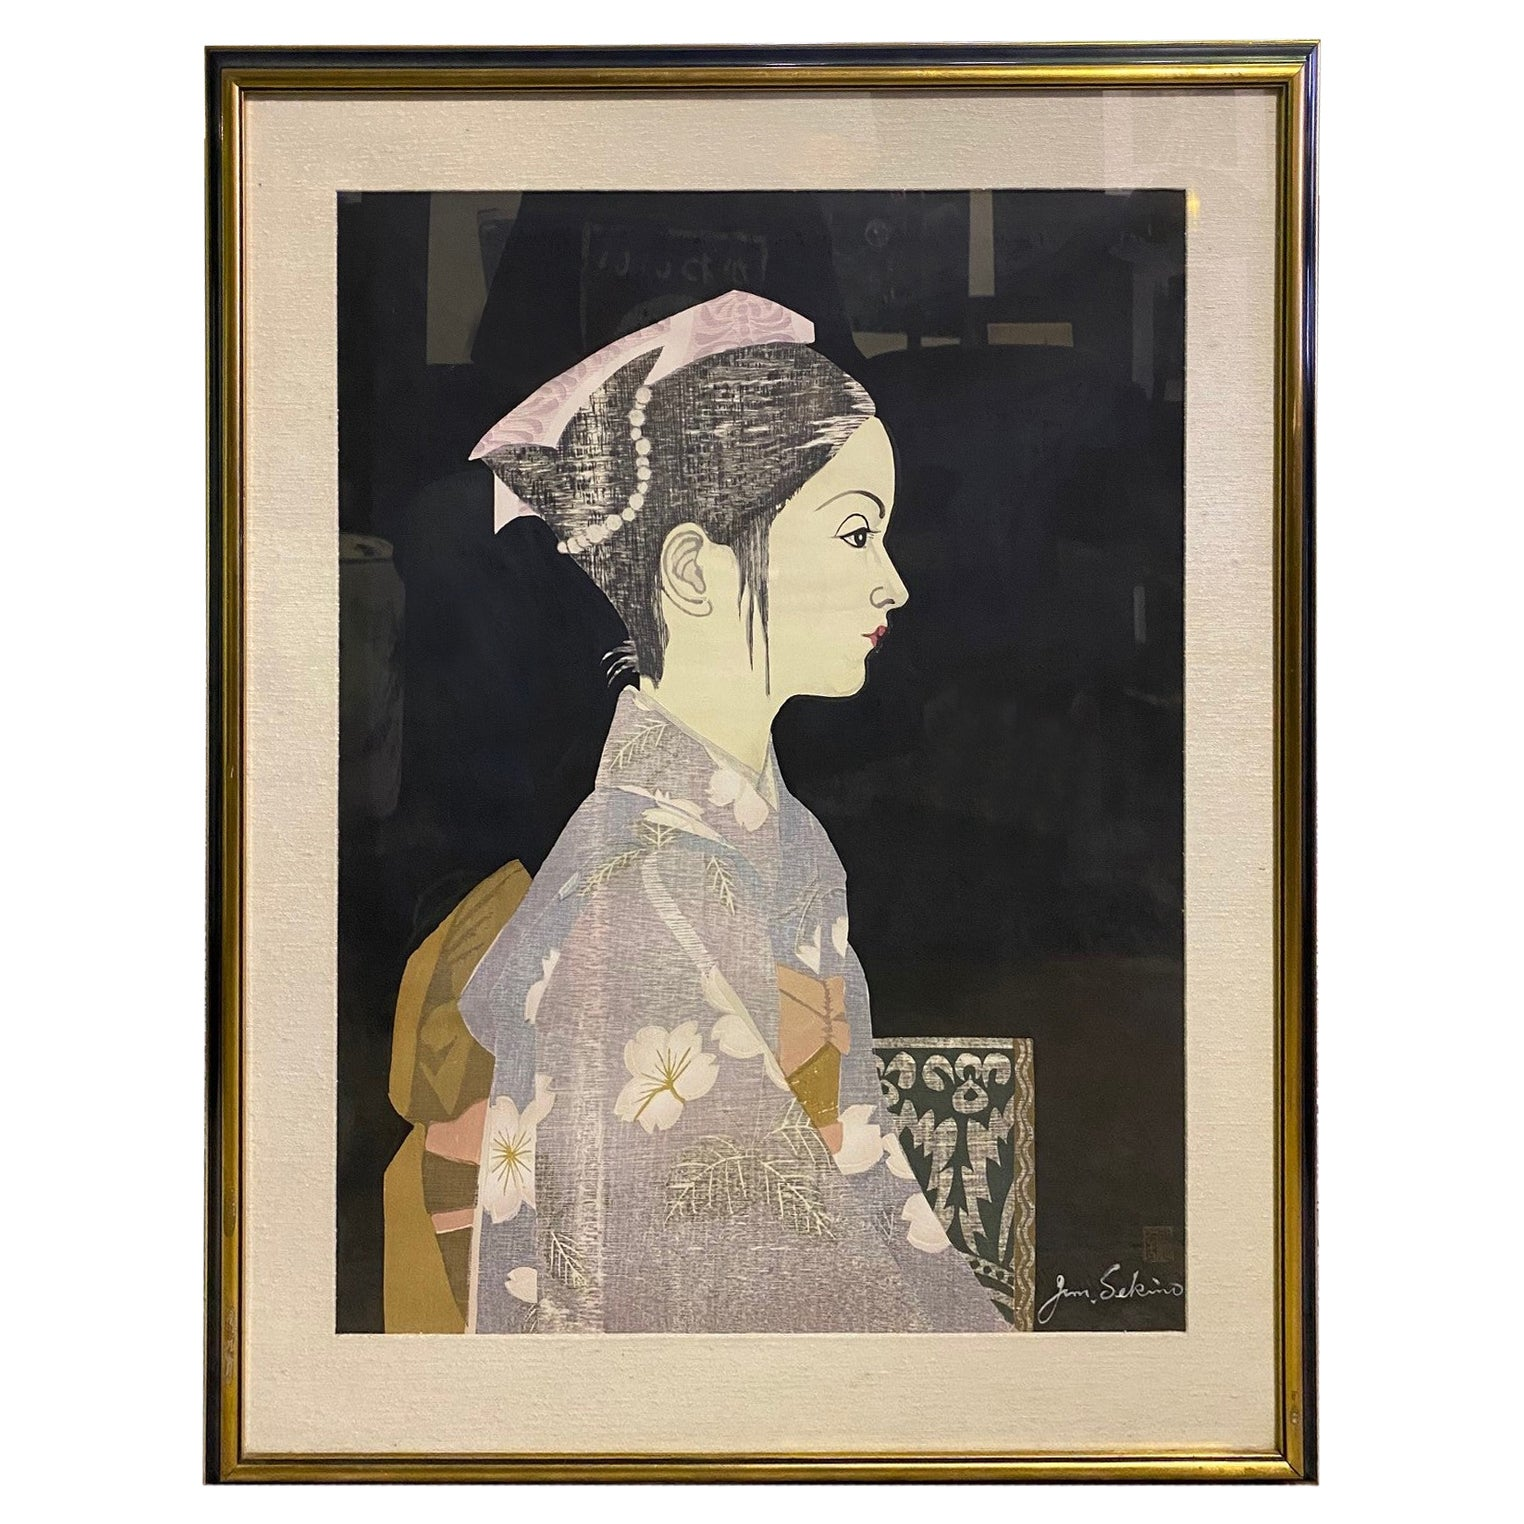 Junichiro Sekino Signed Limited Edition Japanese Woodblock Print Girl in Kimono